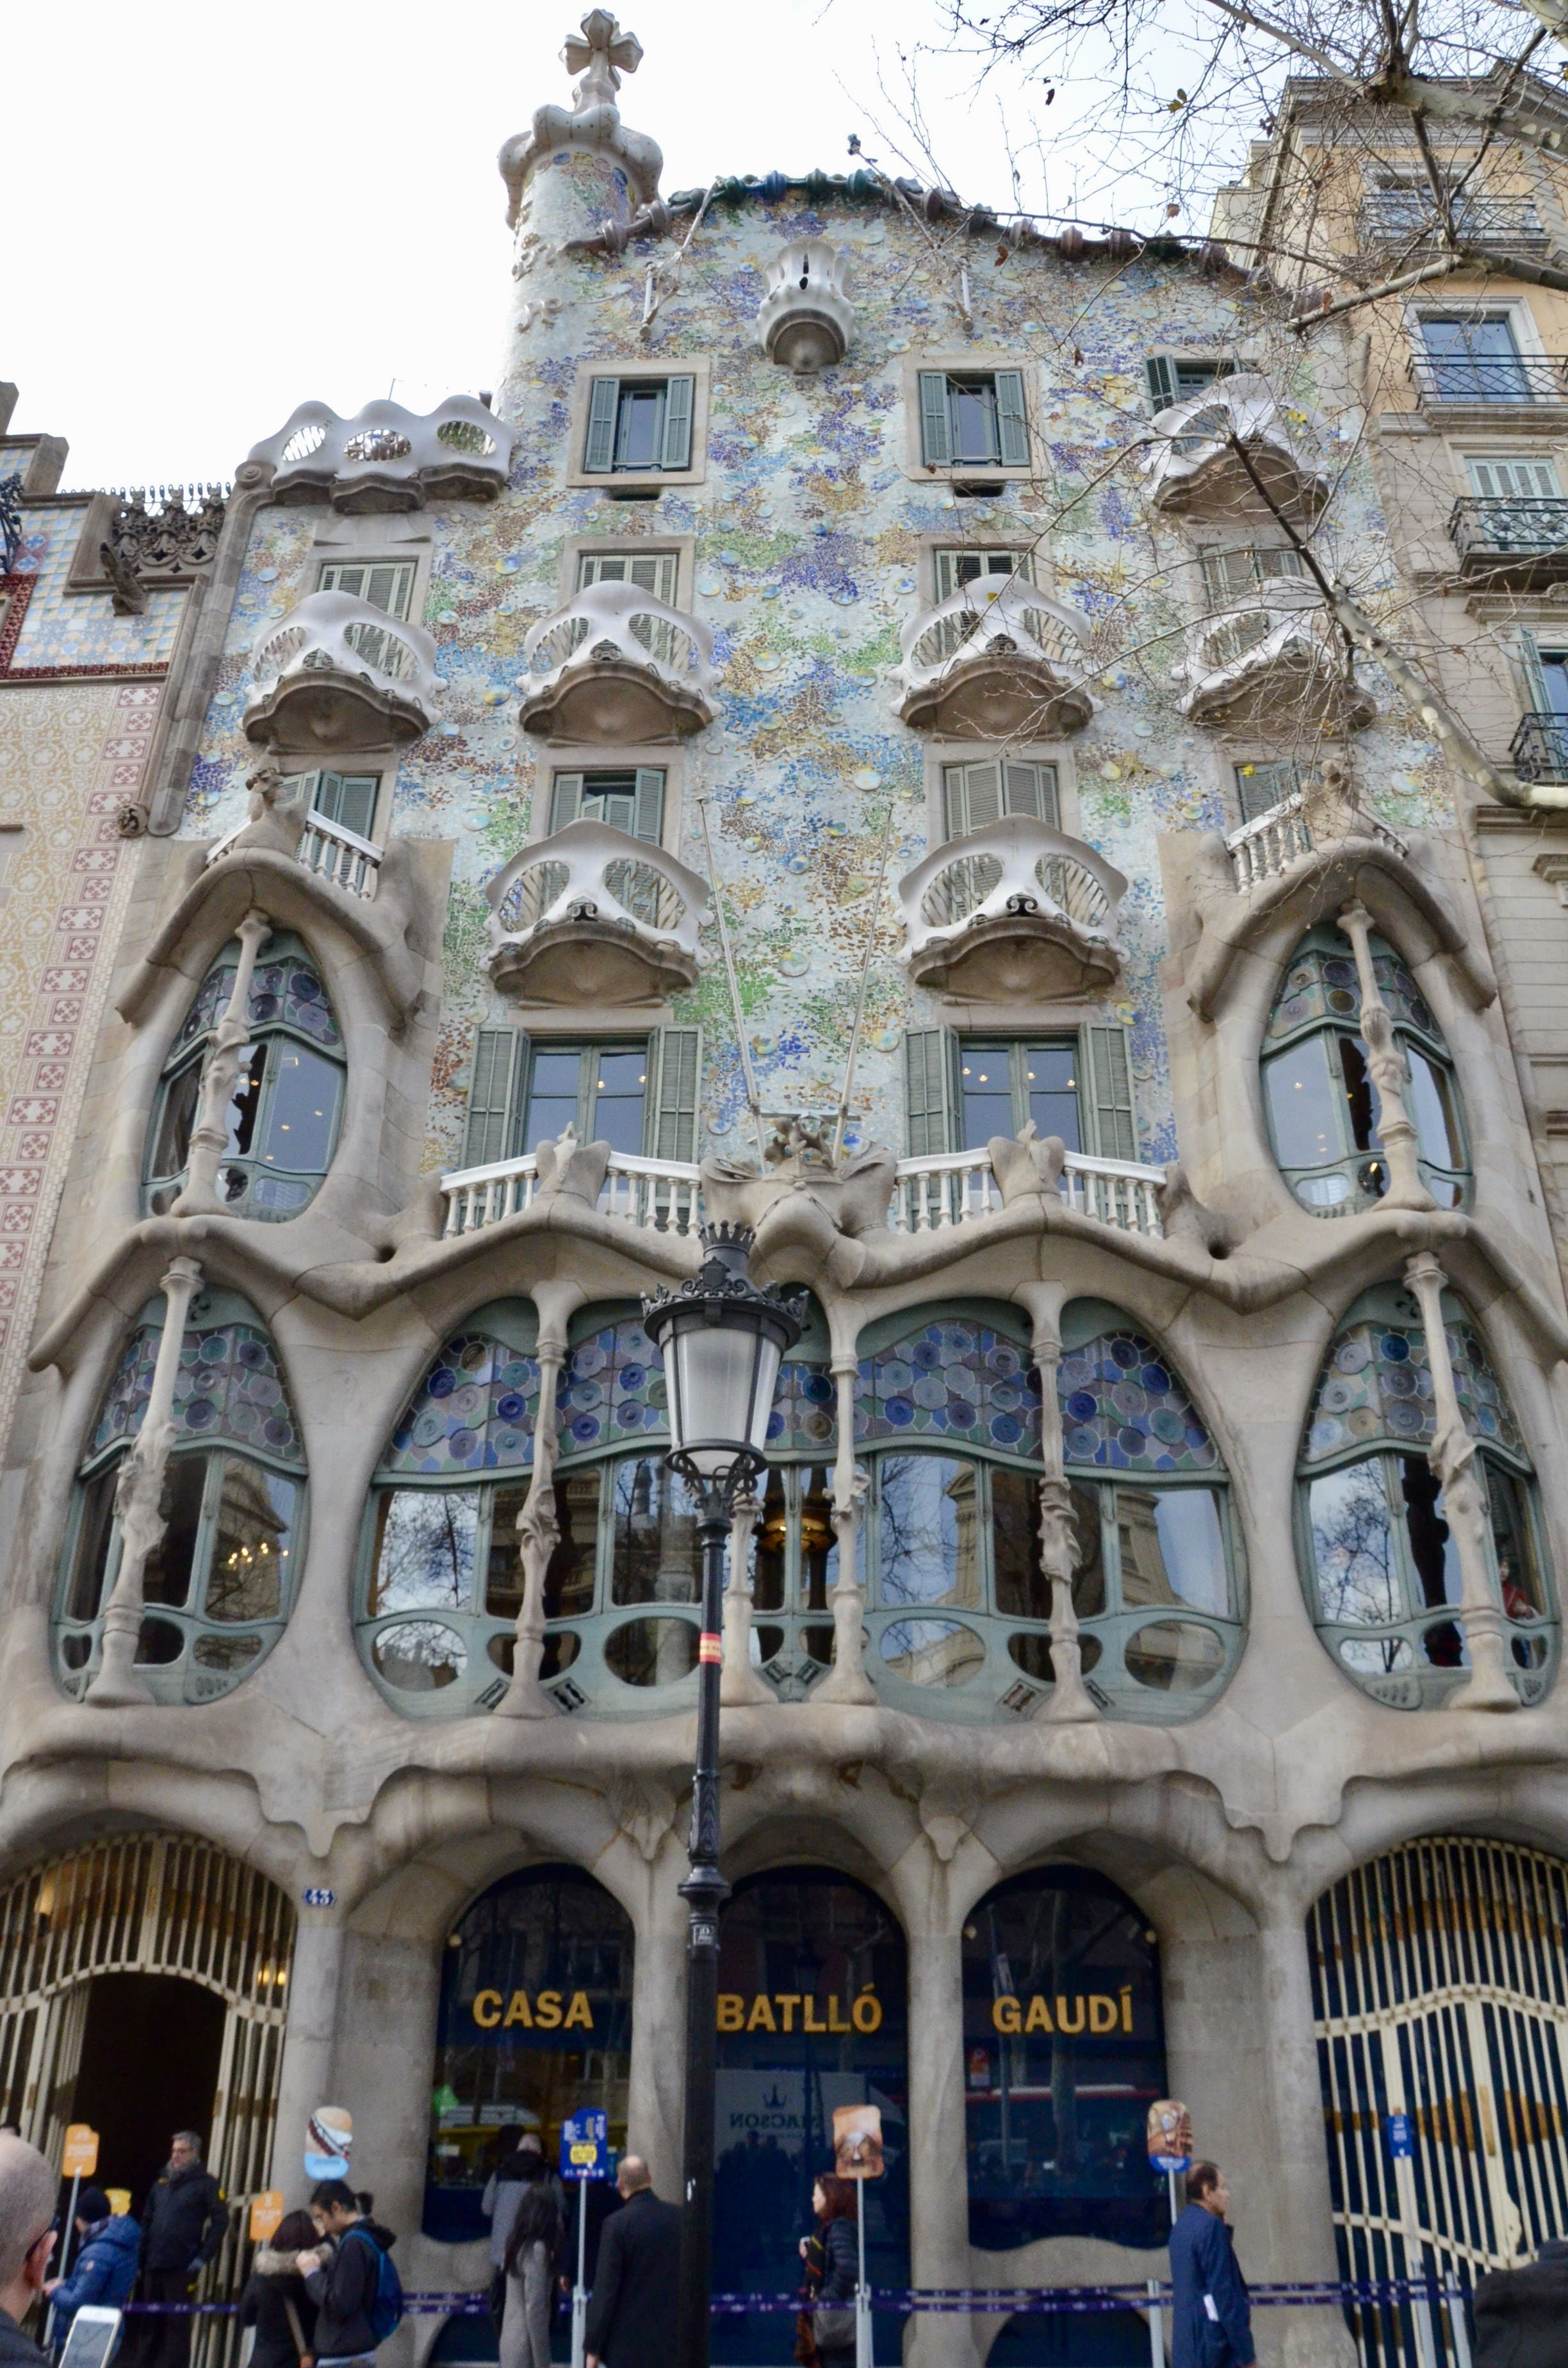 Casa Batlló, Antoni Gaudí Modernist Museum, Barcelona: All ...